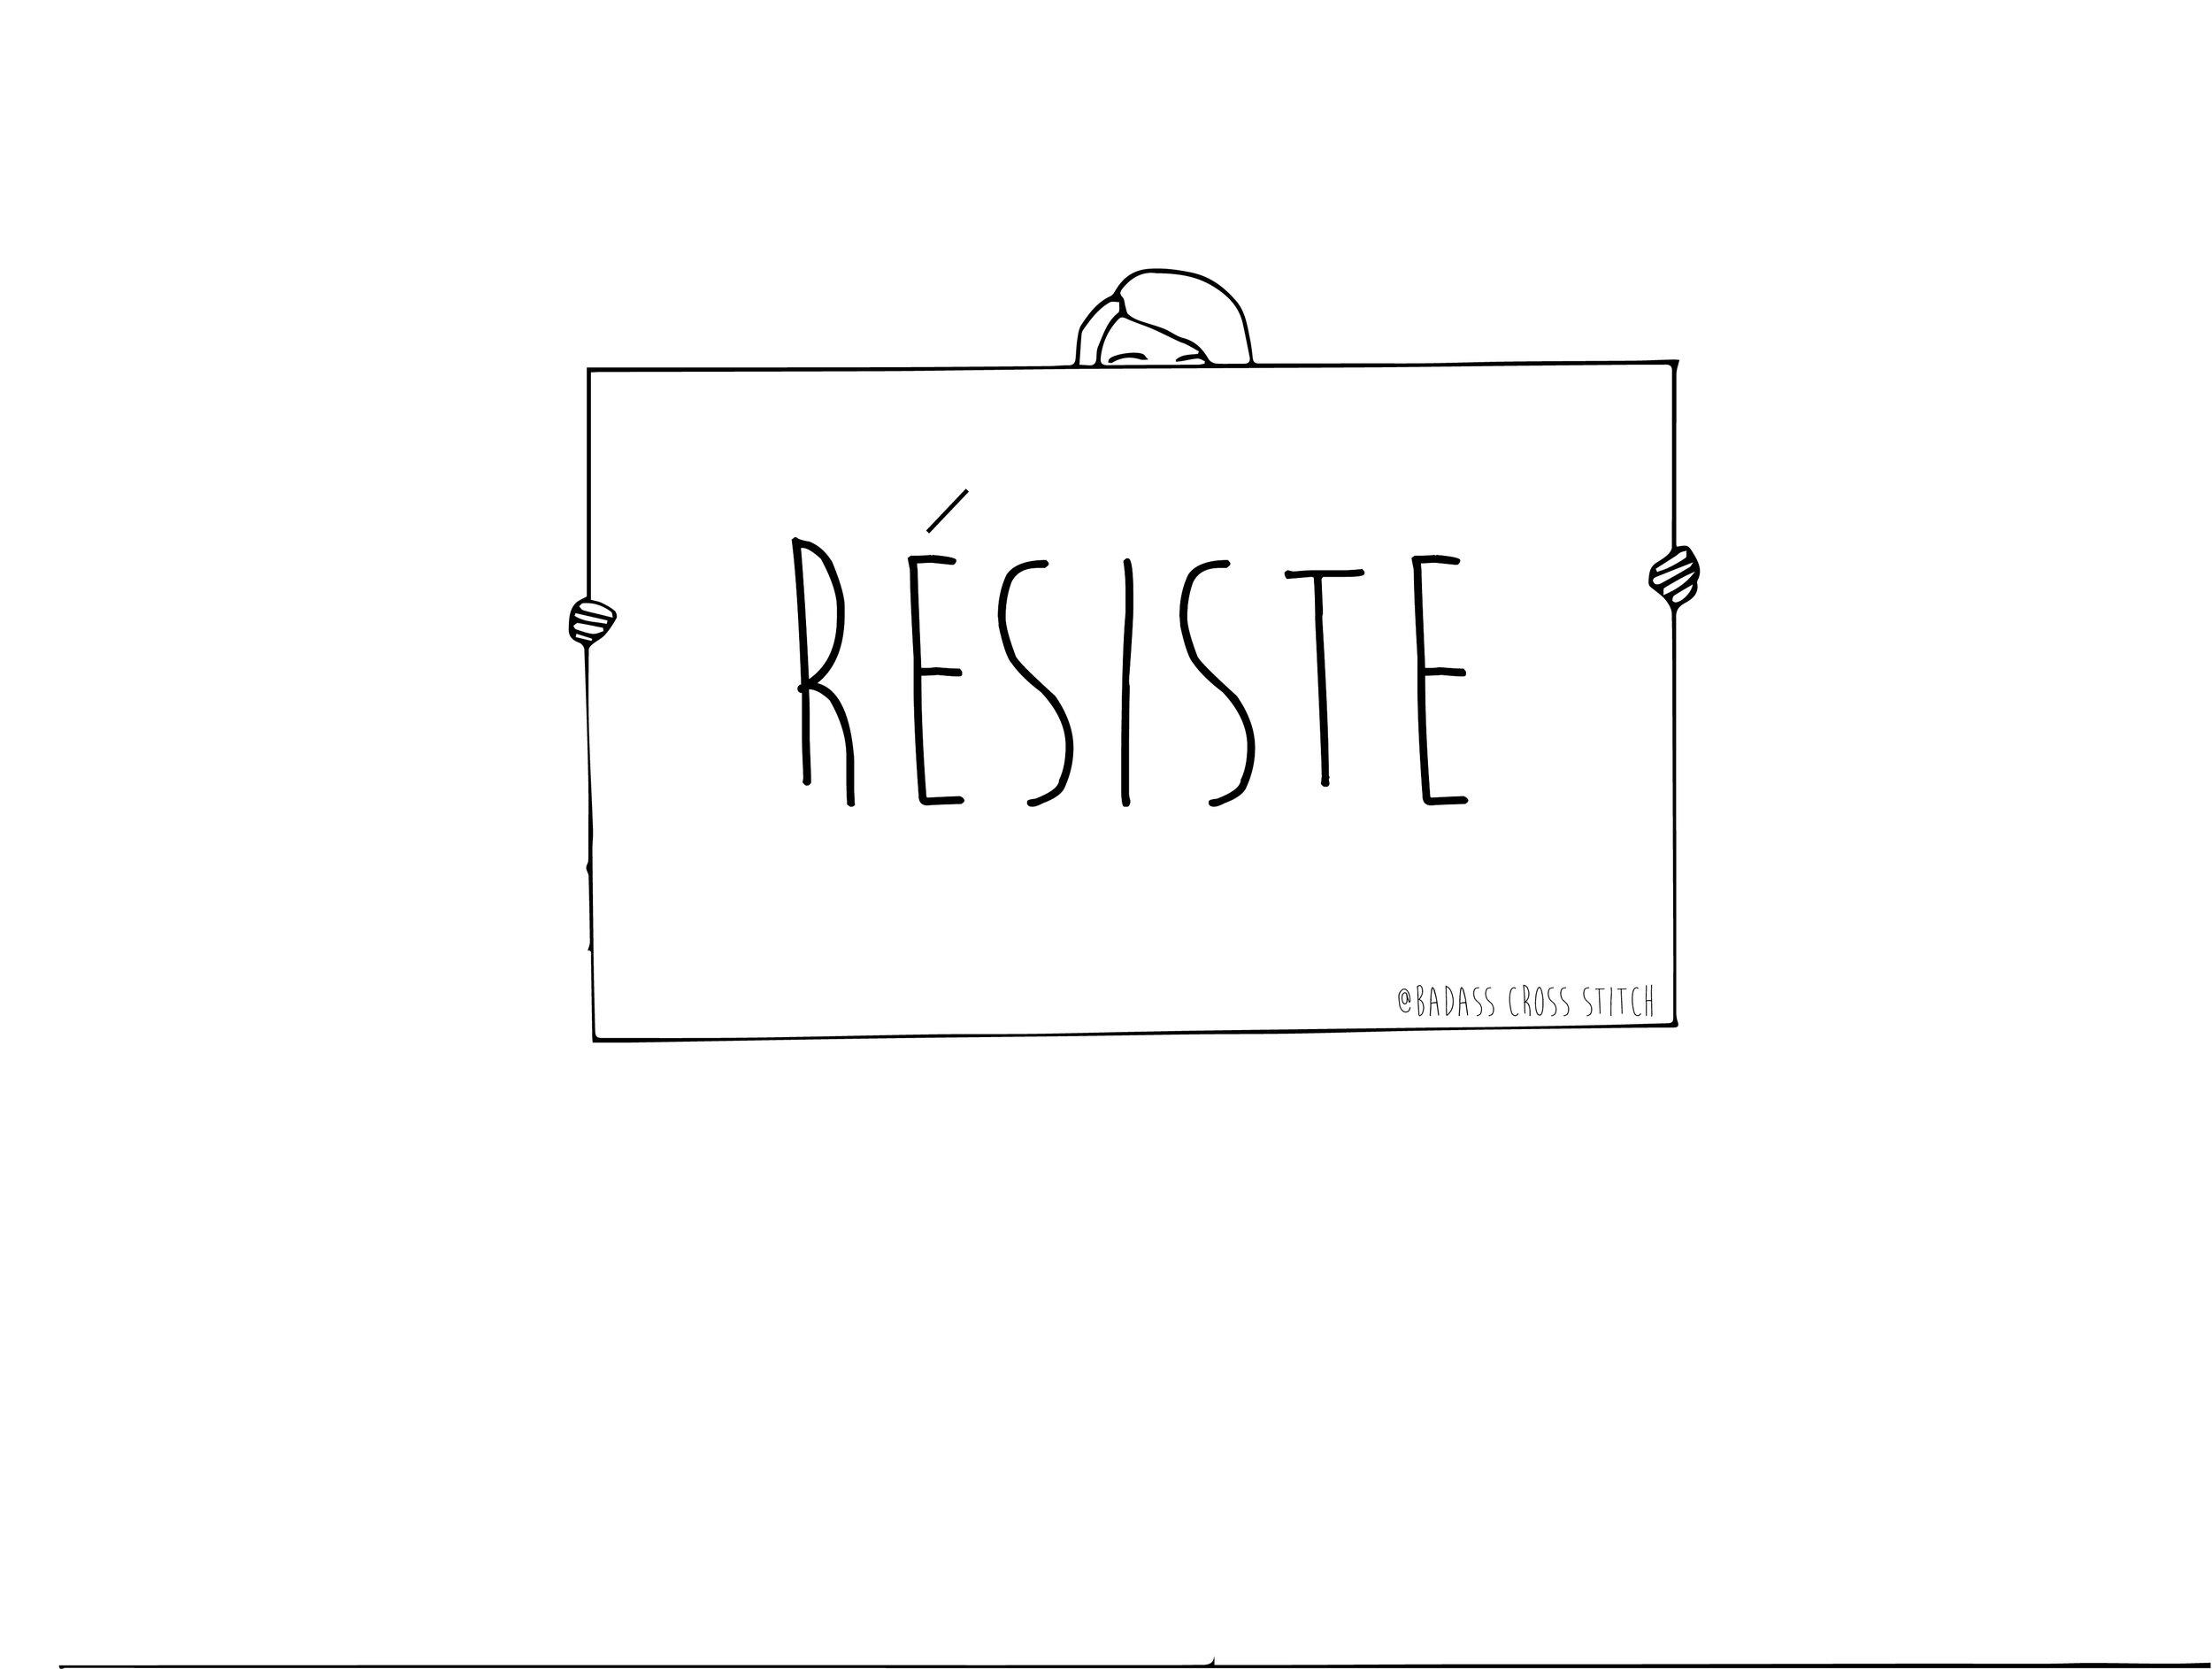 TinyShannon-resistFrench.jpg